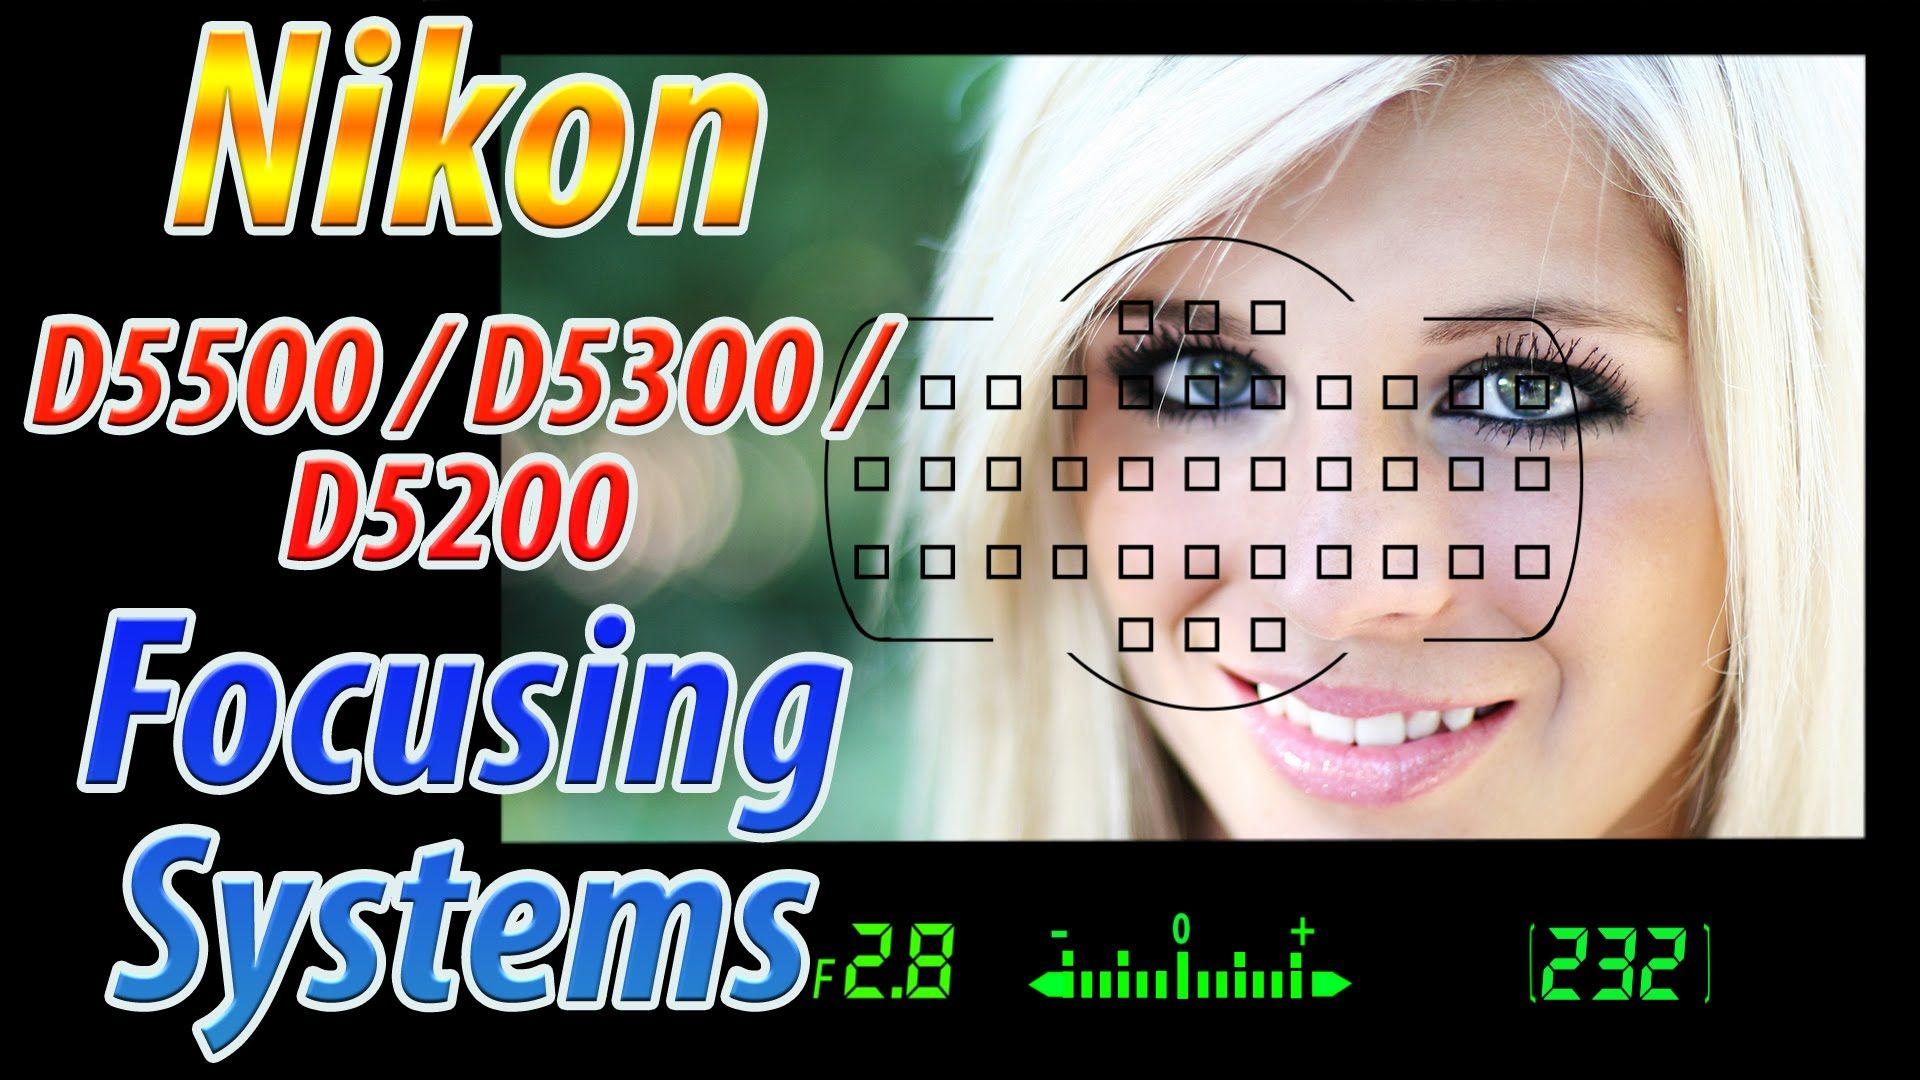 Nikon D5500 / D5300 / D5200 Focus Square Tutorial | How to Focus Trainin...